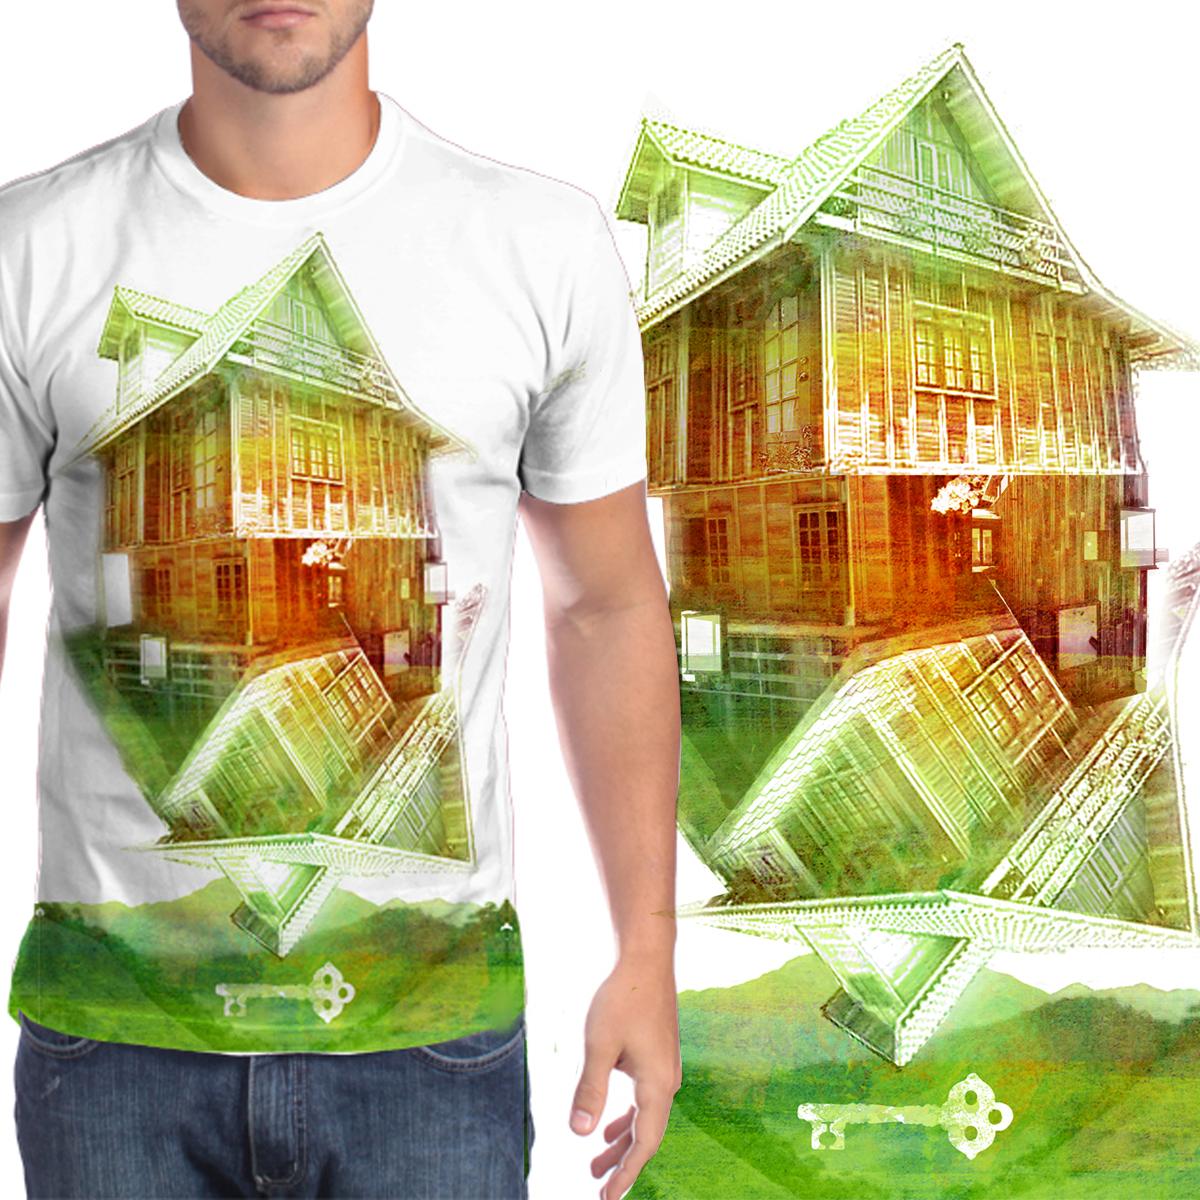 O Arquiteto by diegorgurgel on Threadless